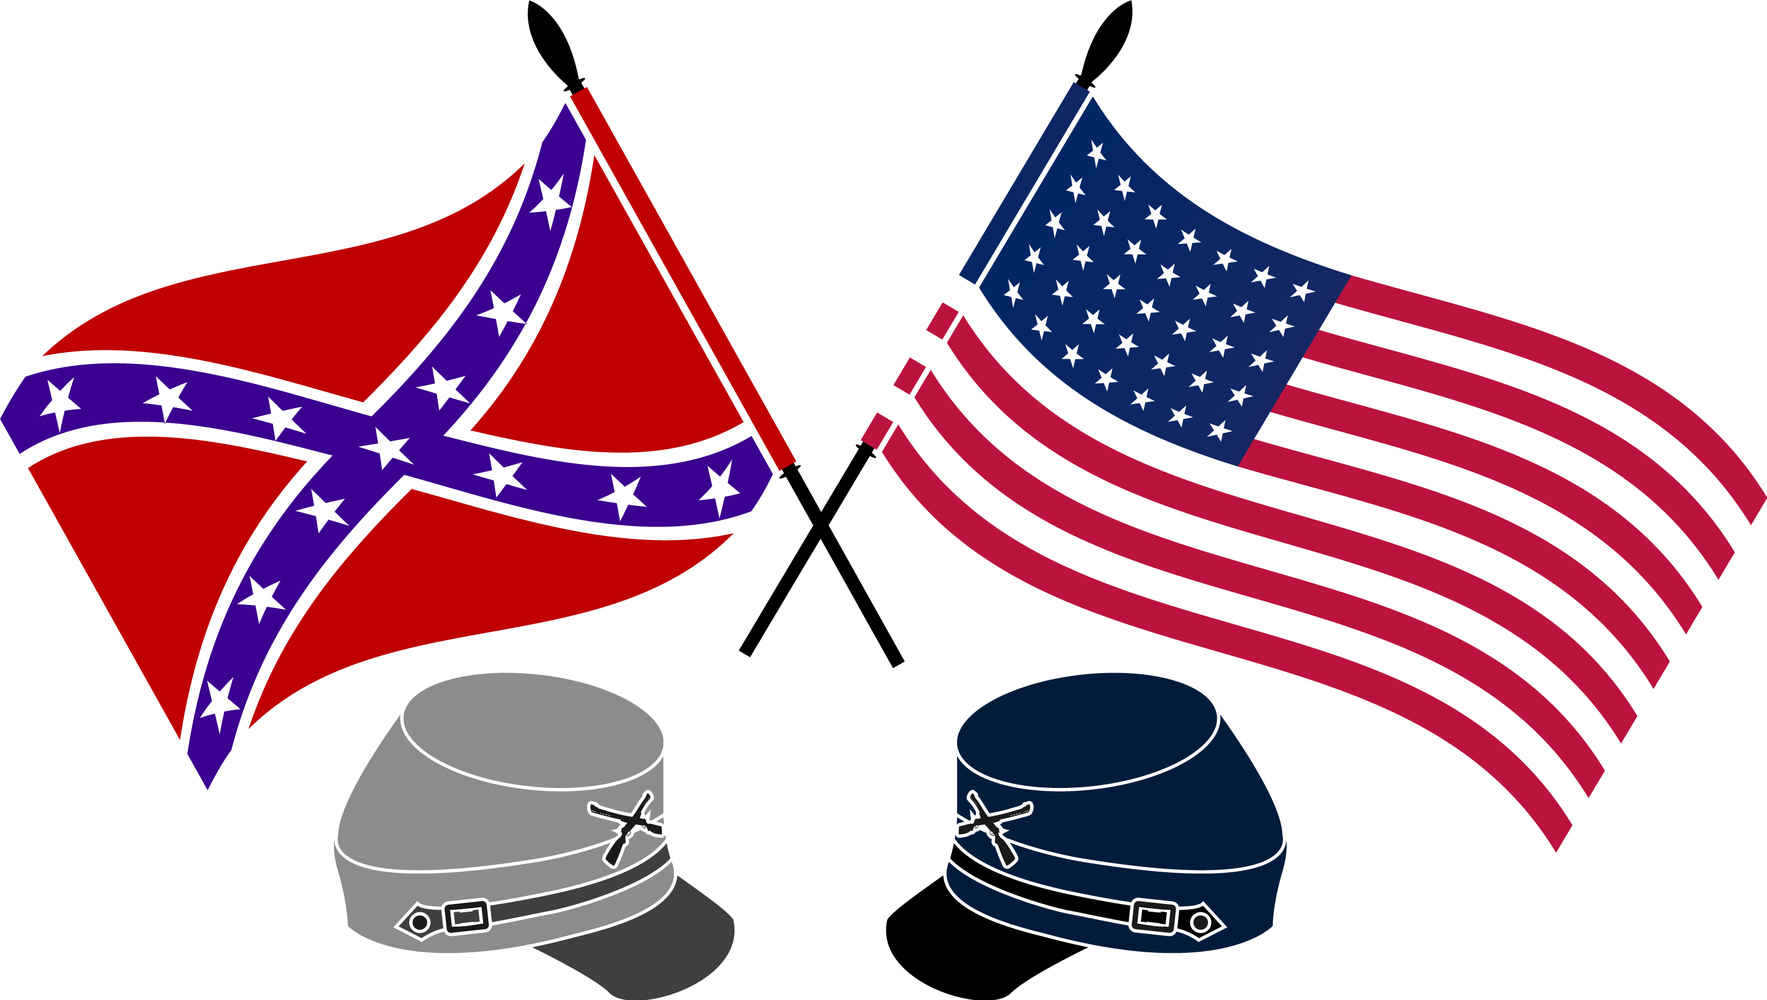 159th Antietam/Sharpsburg Event image